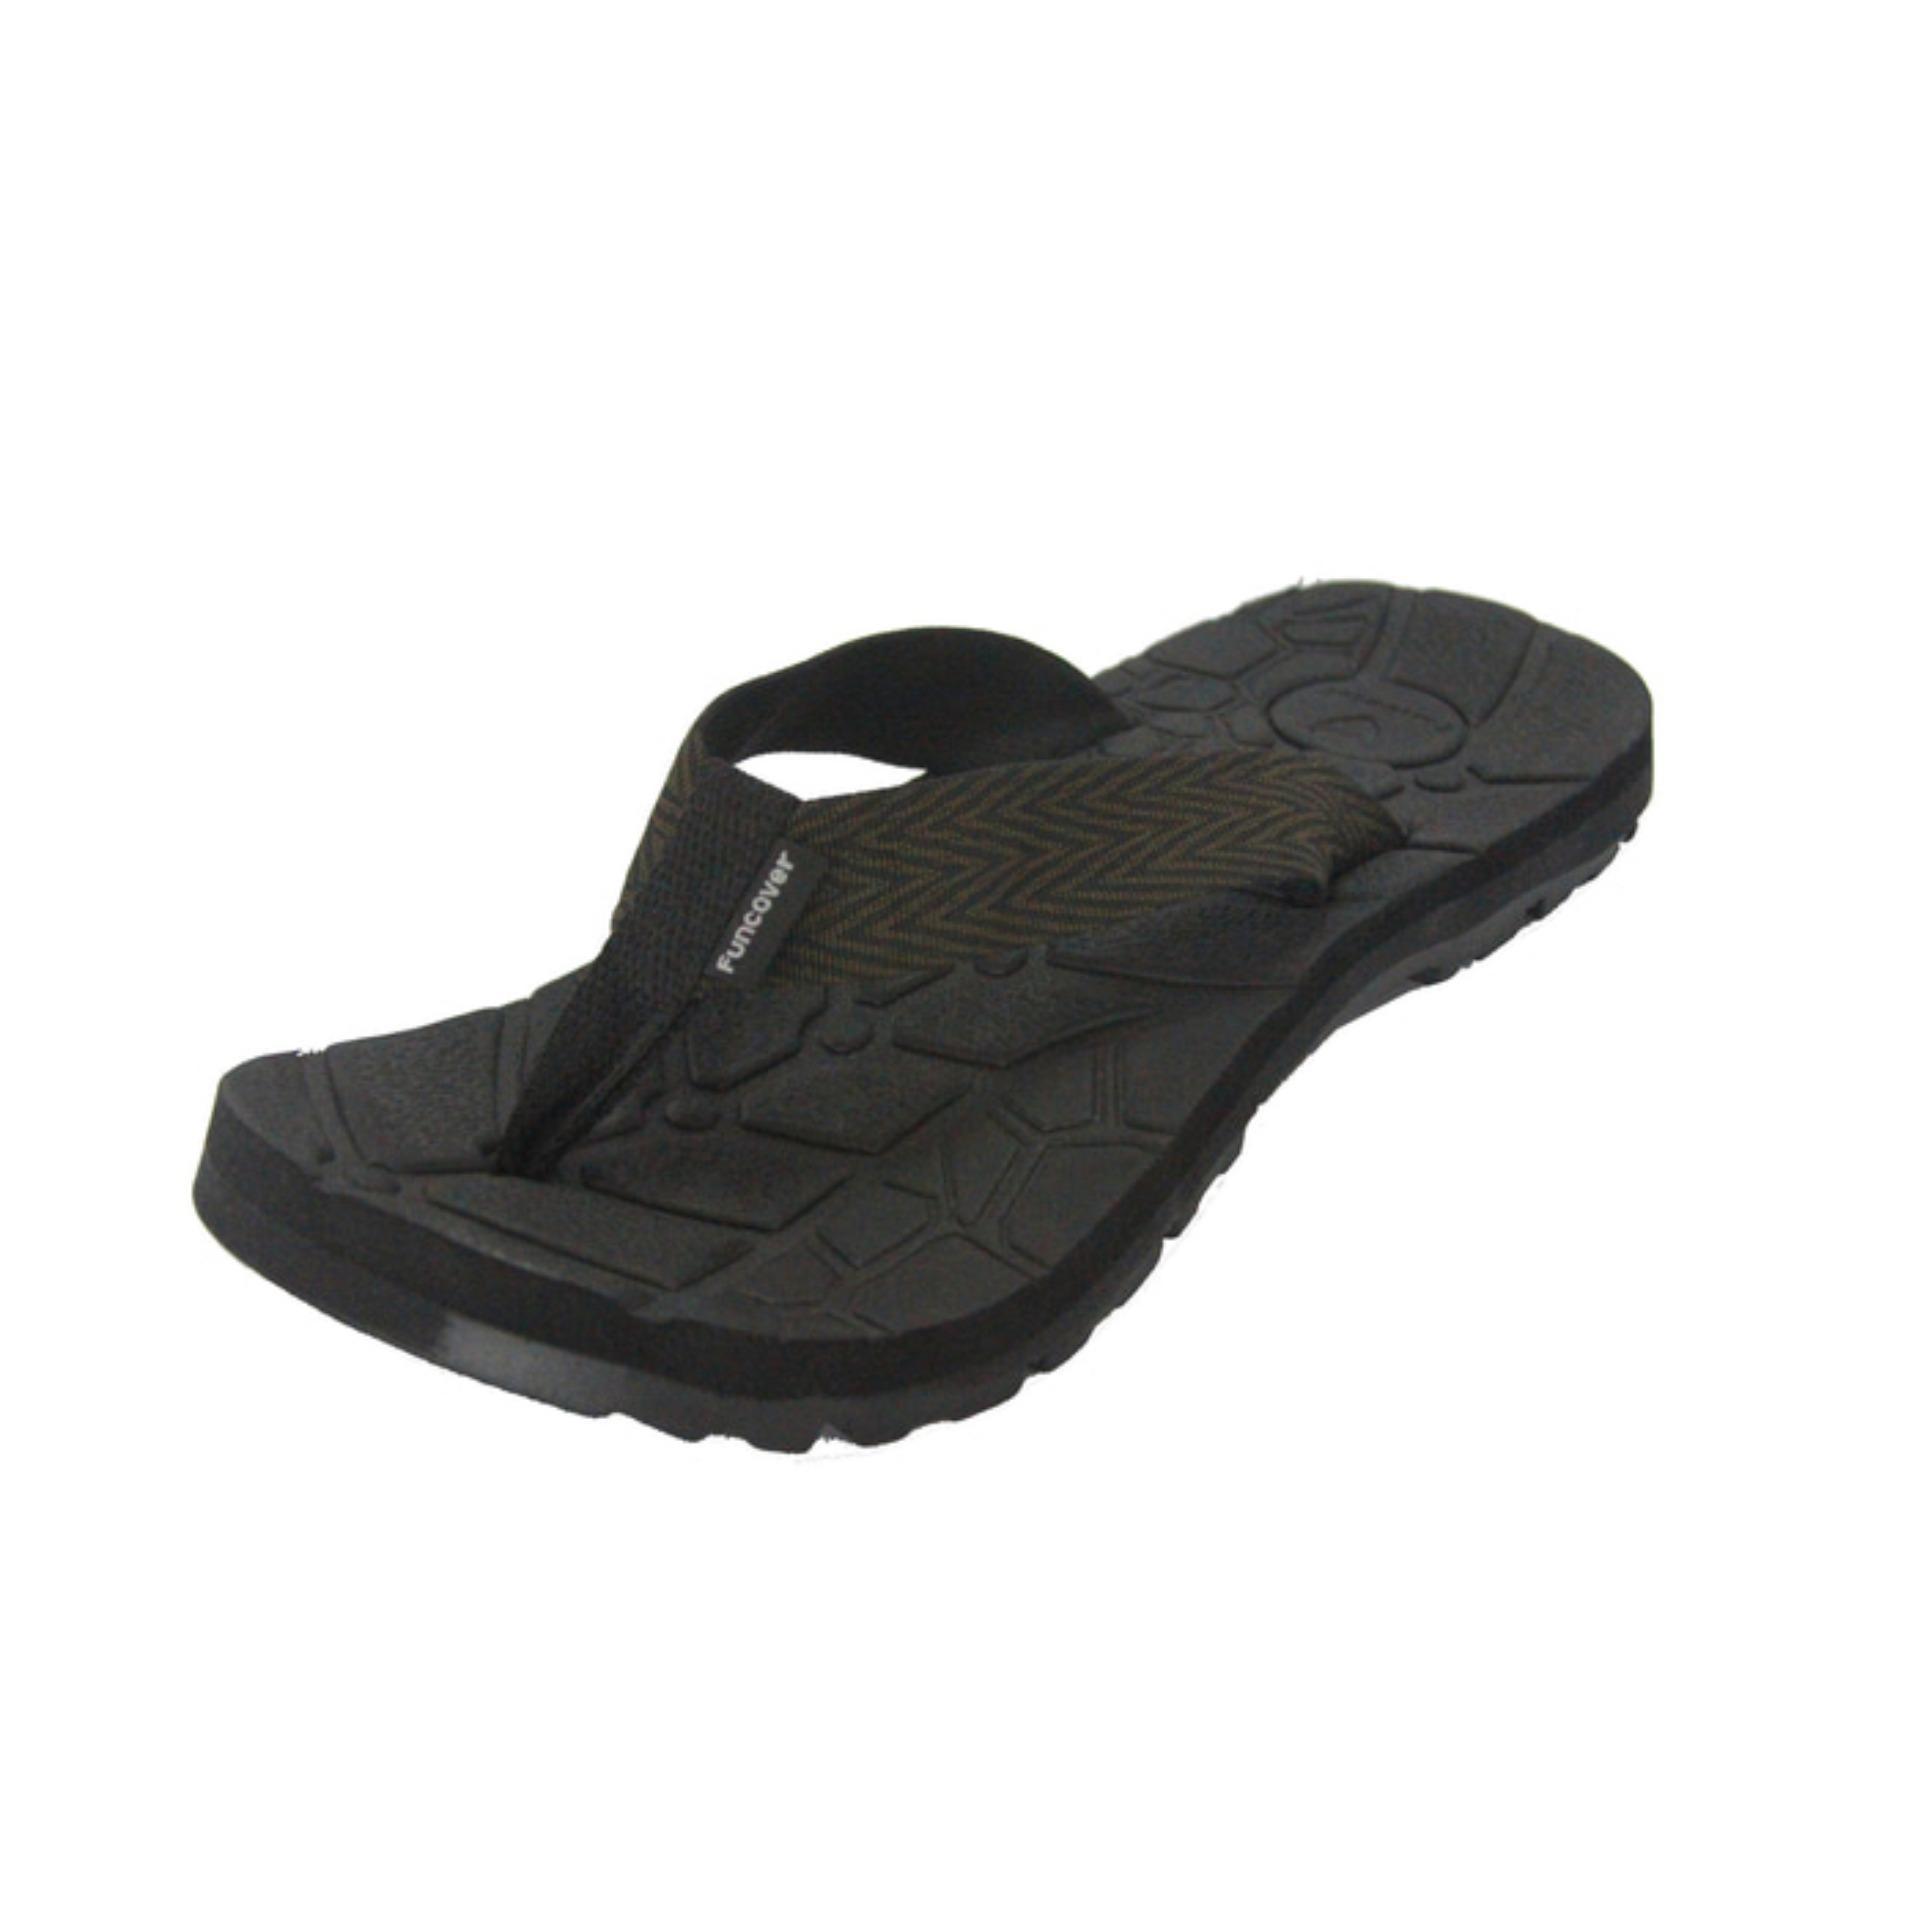 LBGS - Sandal Gunung Jepit Outdoor Funcover Sport Original Mirip Eigere Semeru